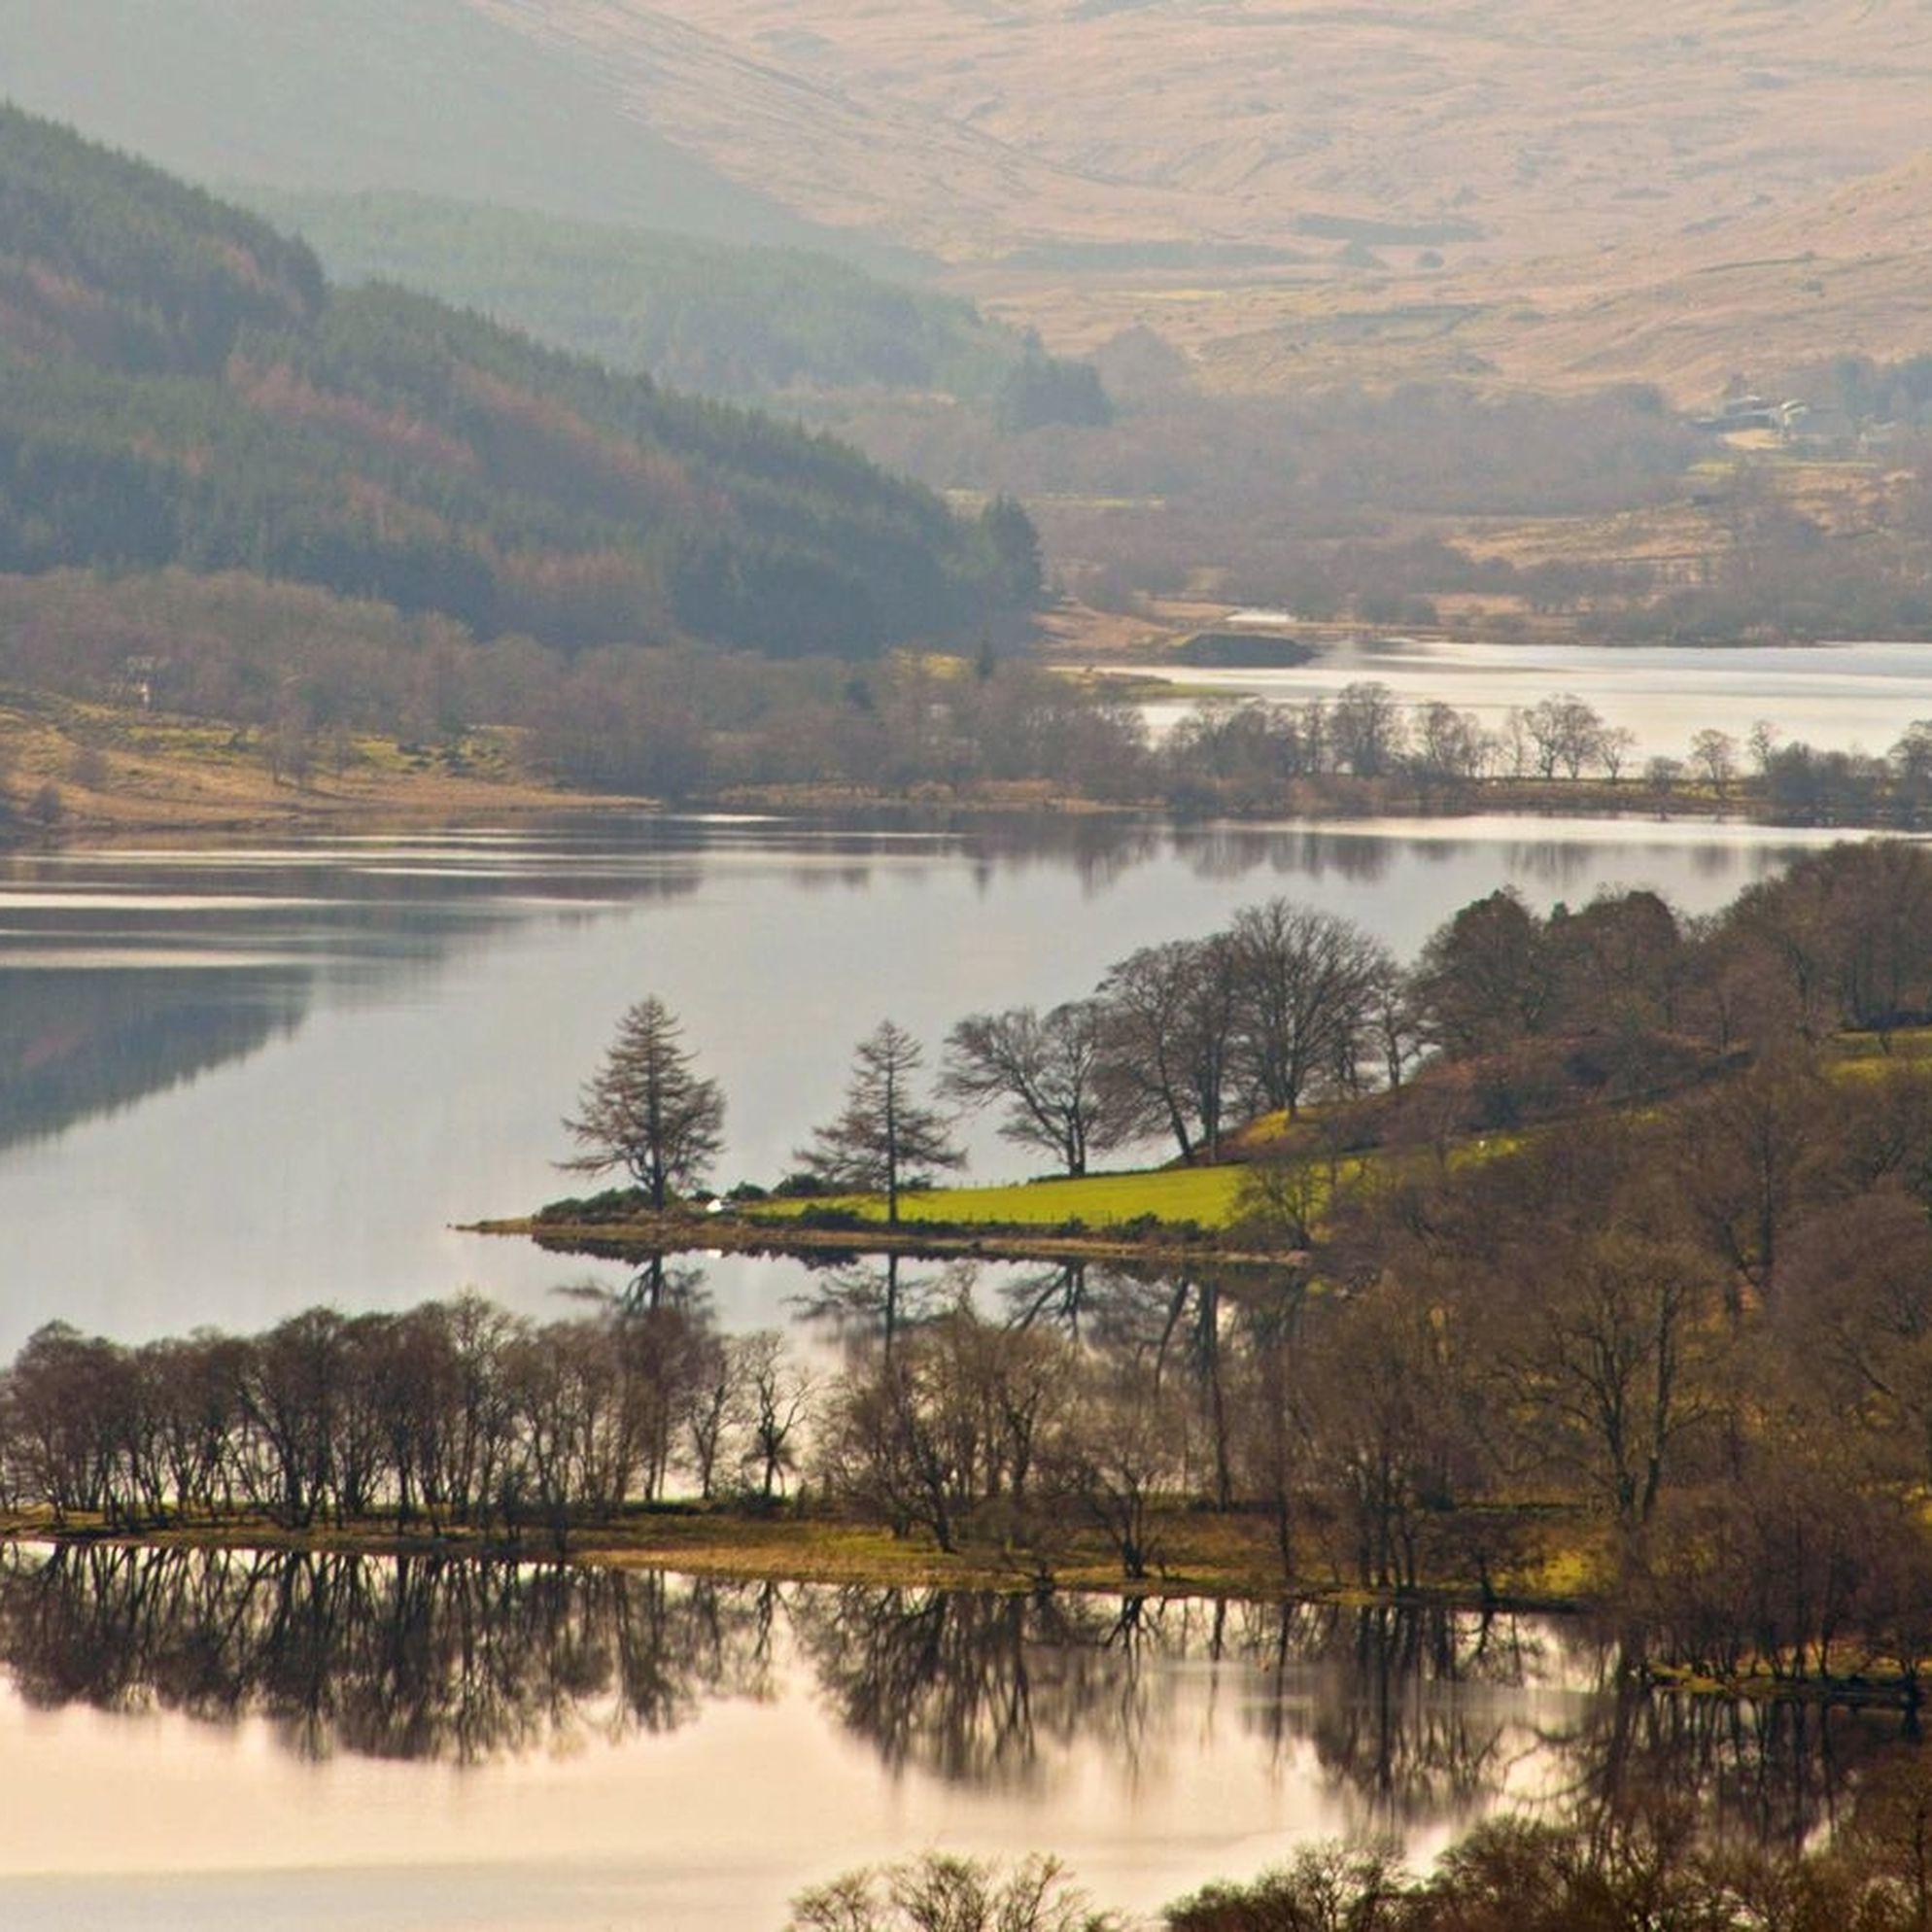 Our favourite lakeside destinations